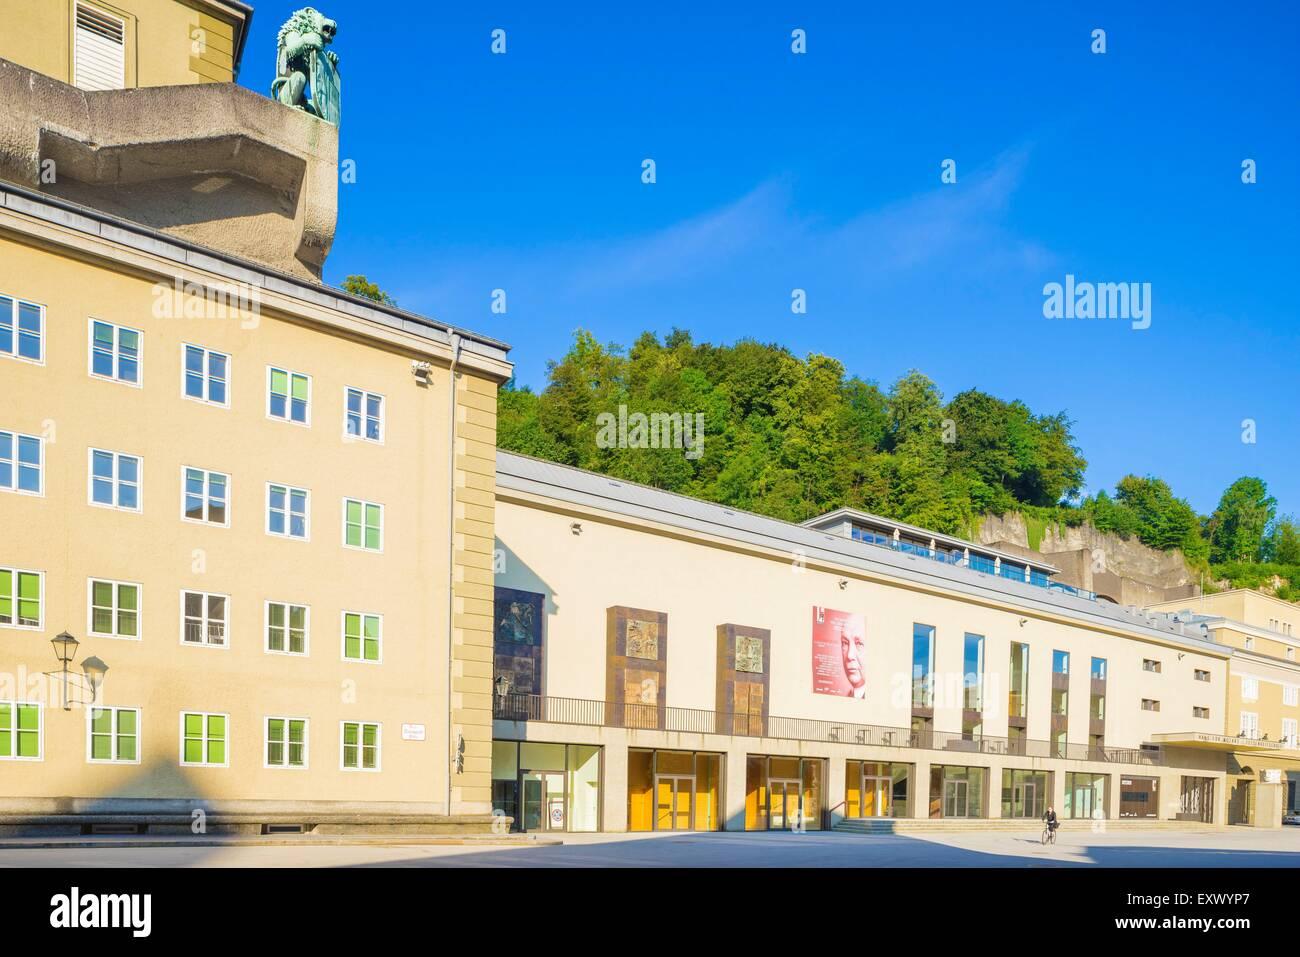 Festival hall, Salzburg, Austria Stock Photo